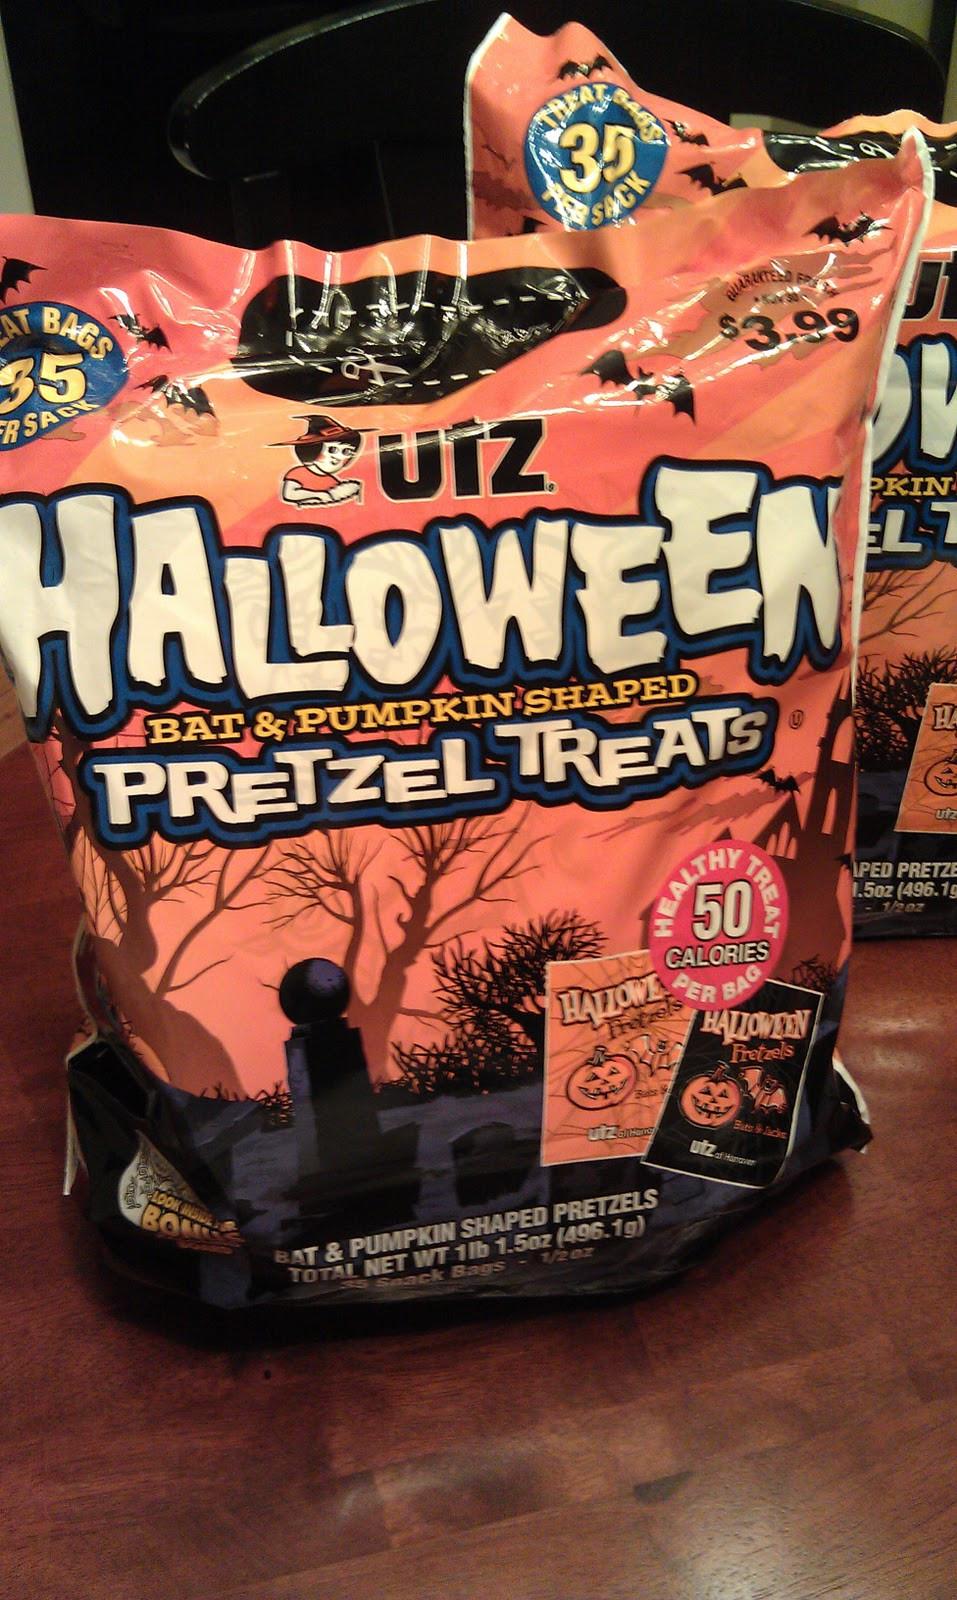 Utz Halloween Pretzels  Peanut Allergy Free Here We e Allergy Friendly